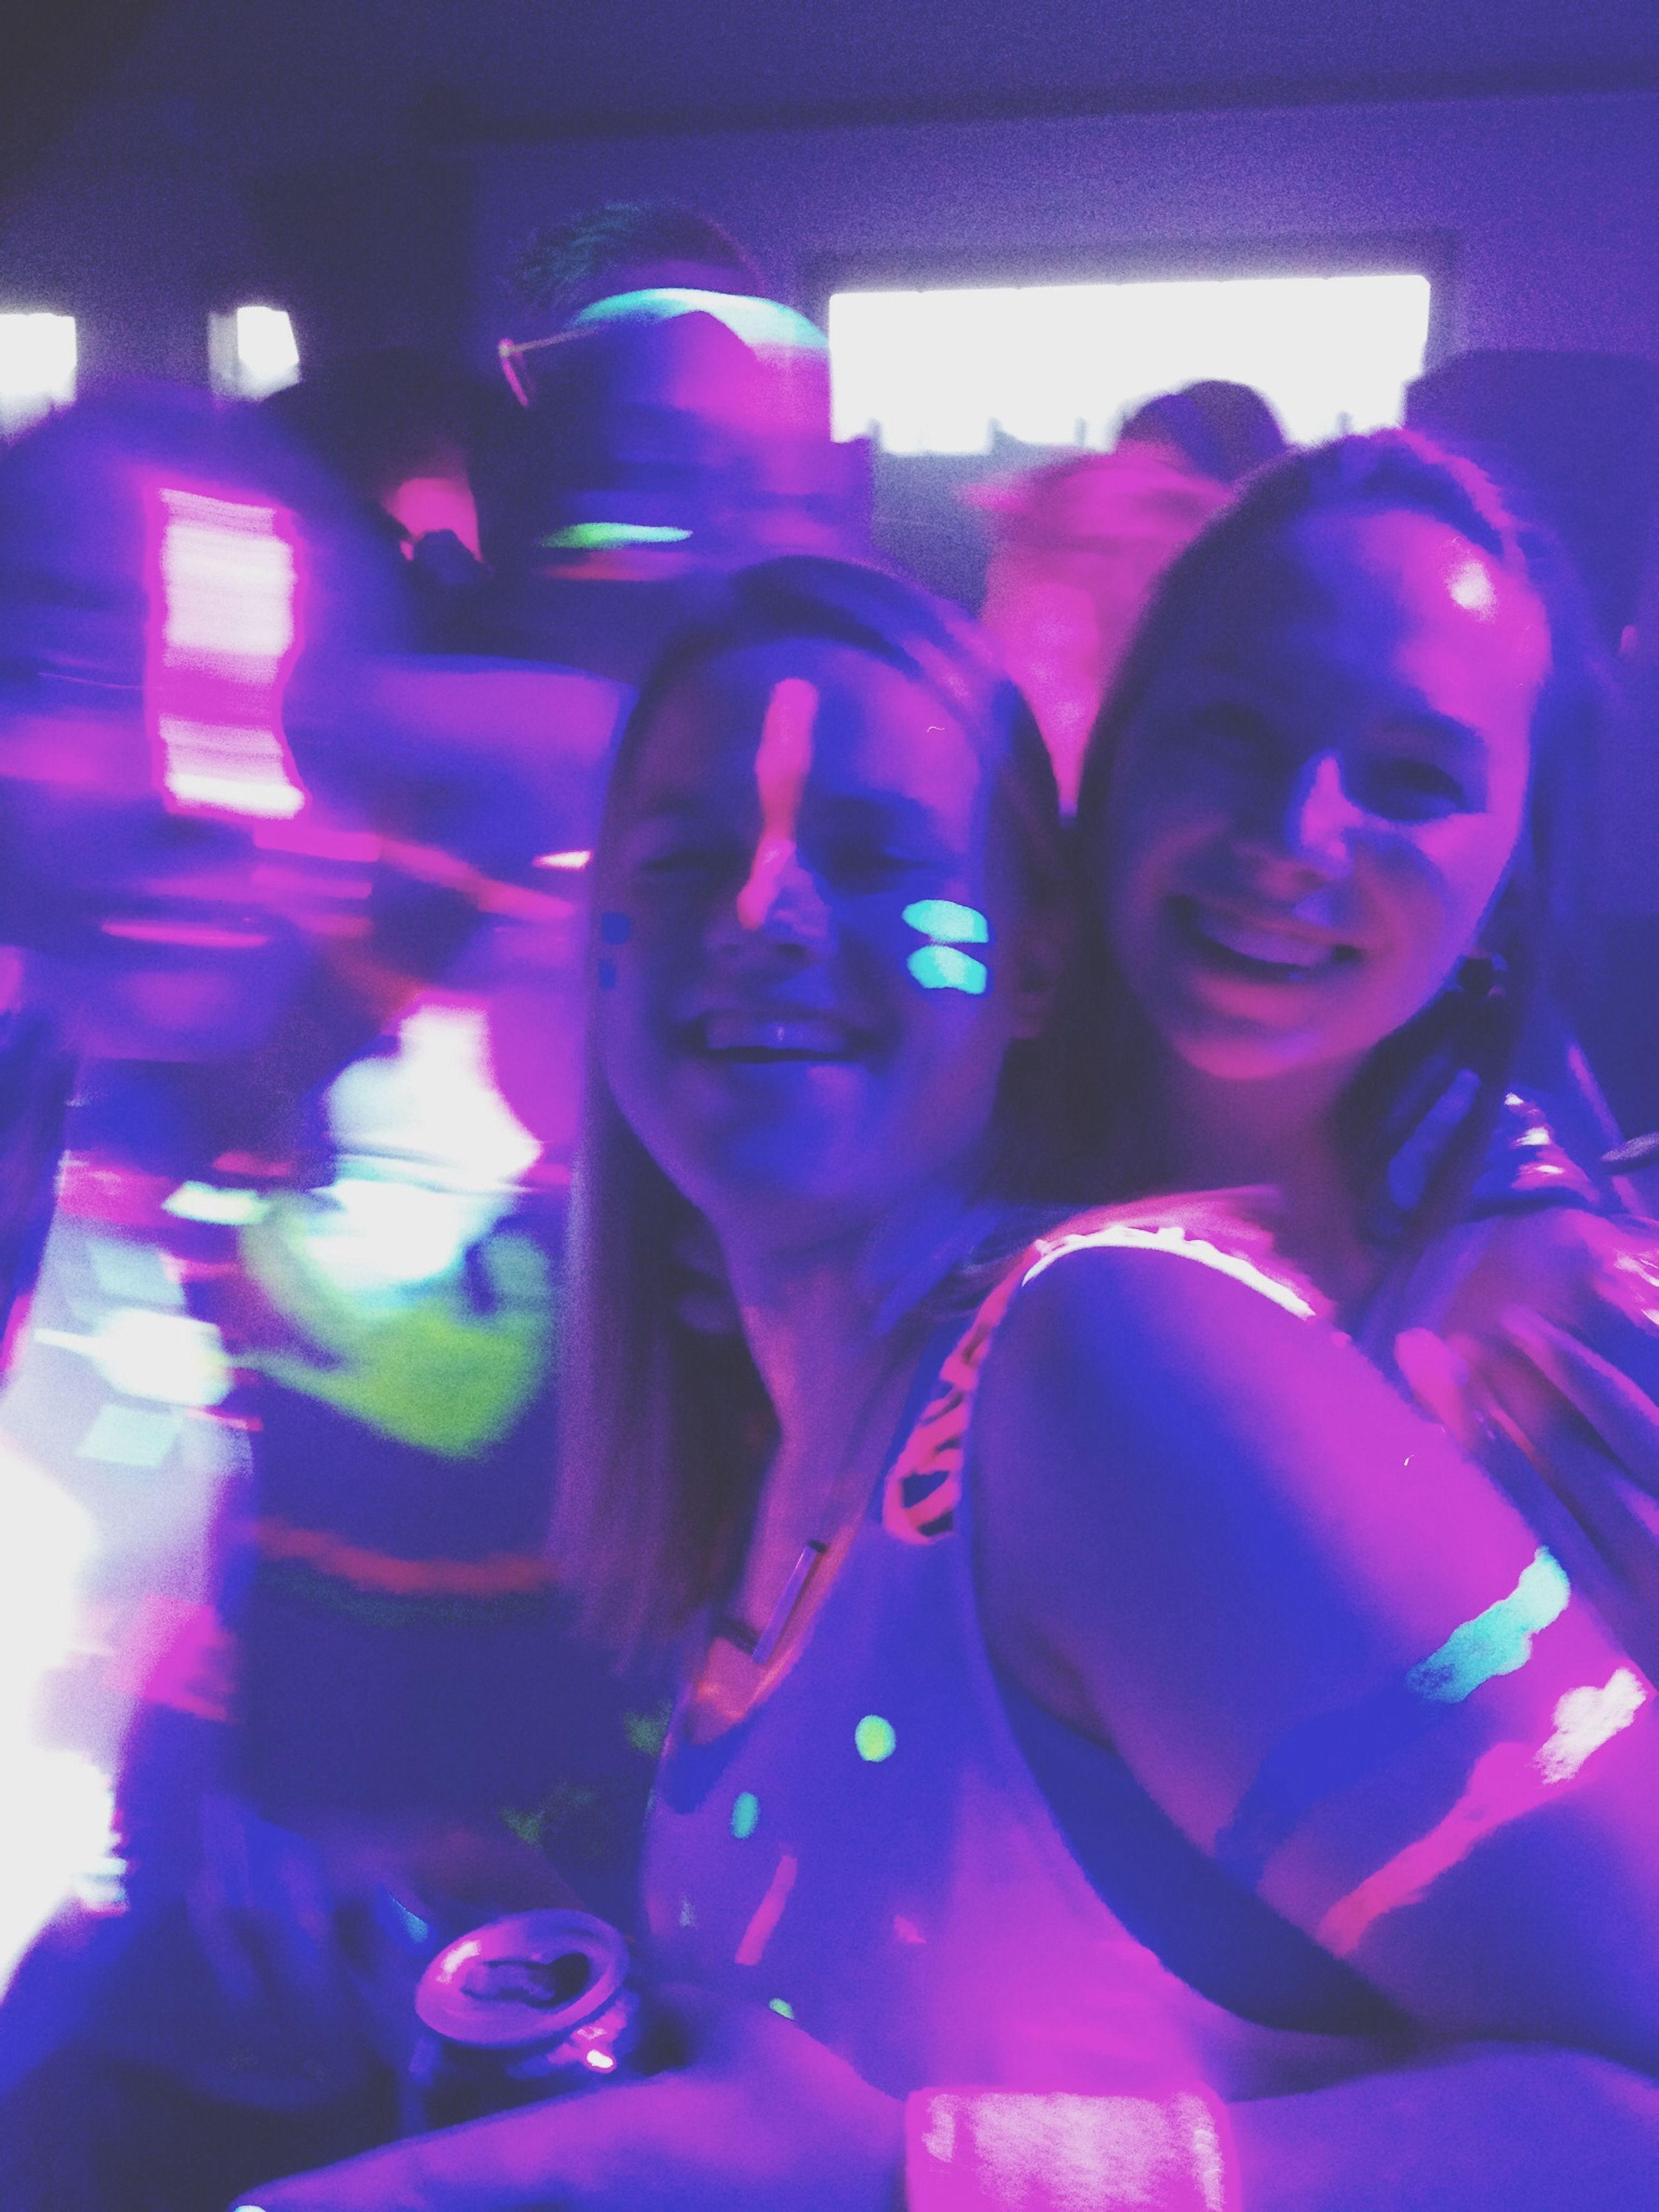 Rave Party Enjoying Life People